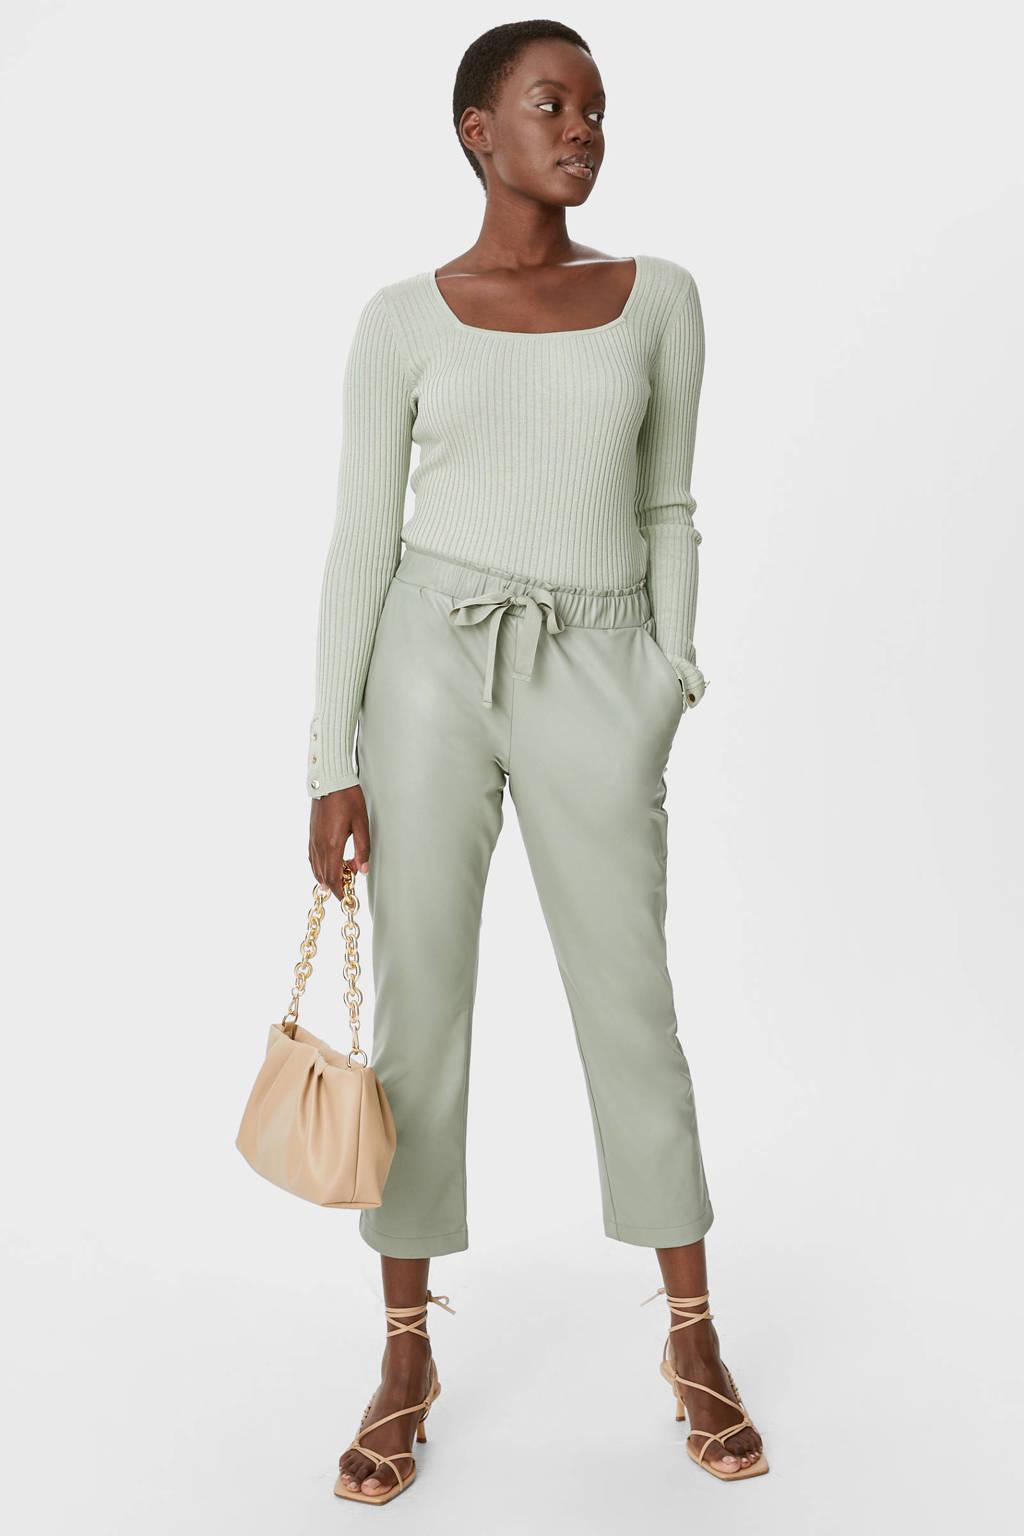 C&A YESSICA PREMIUM imitatieleren straight fit pantalon mintgroen, Mintgroen